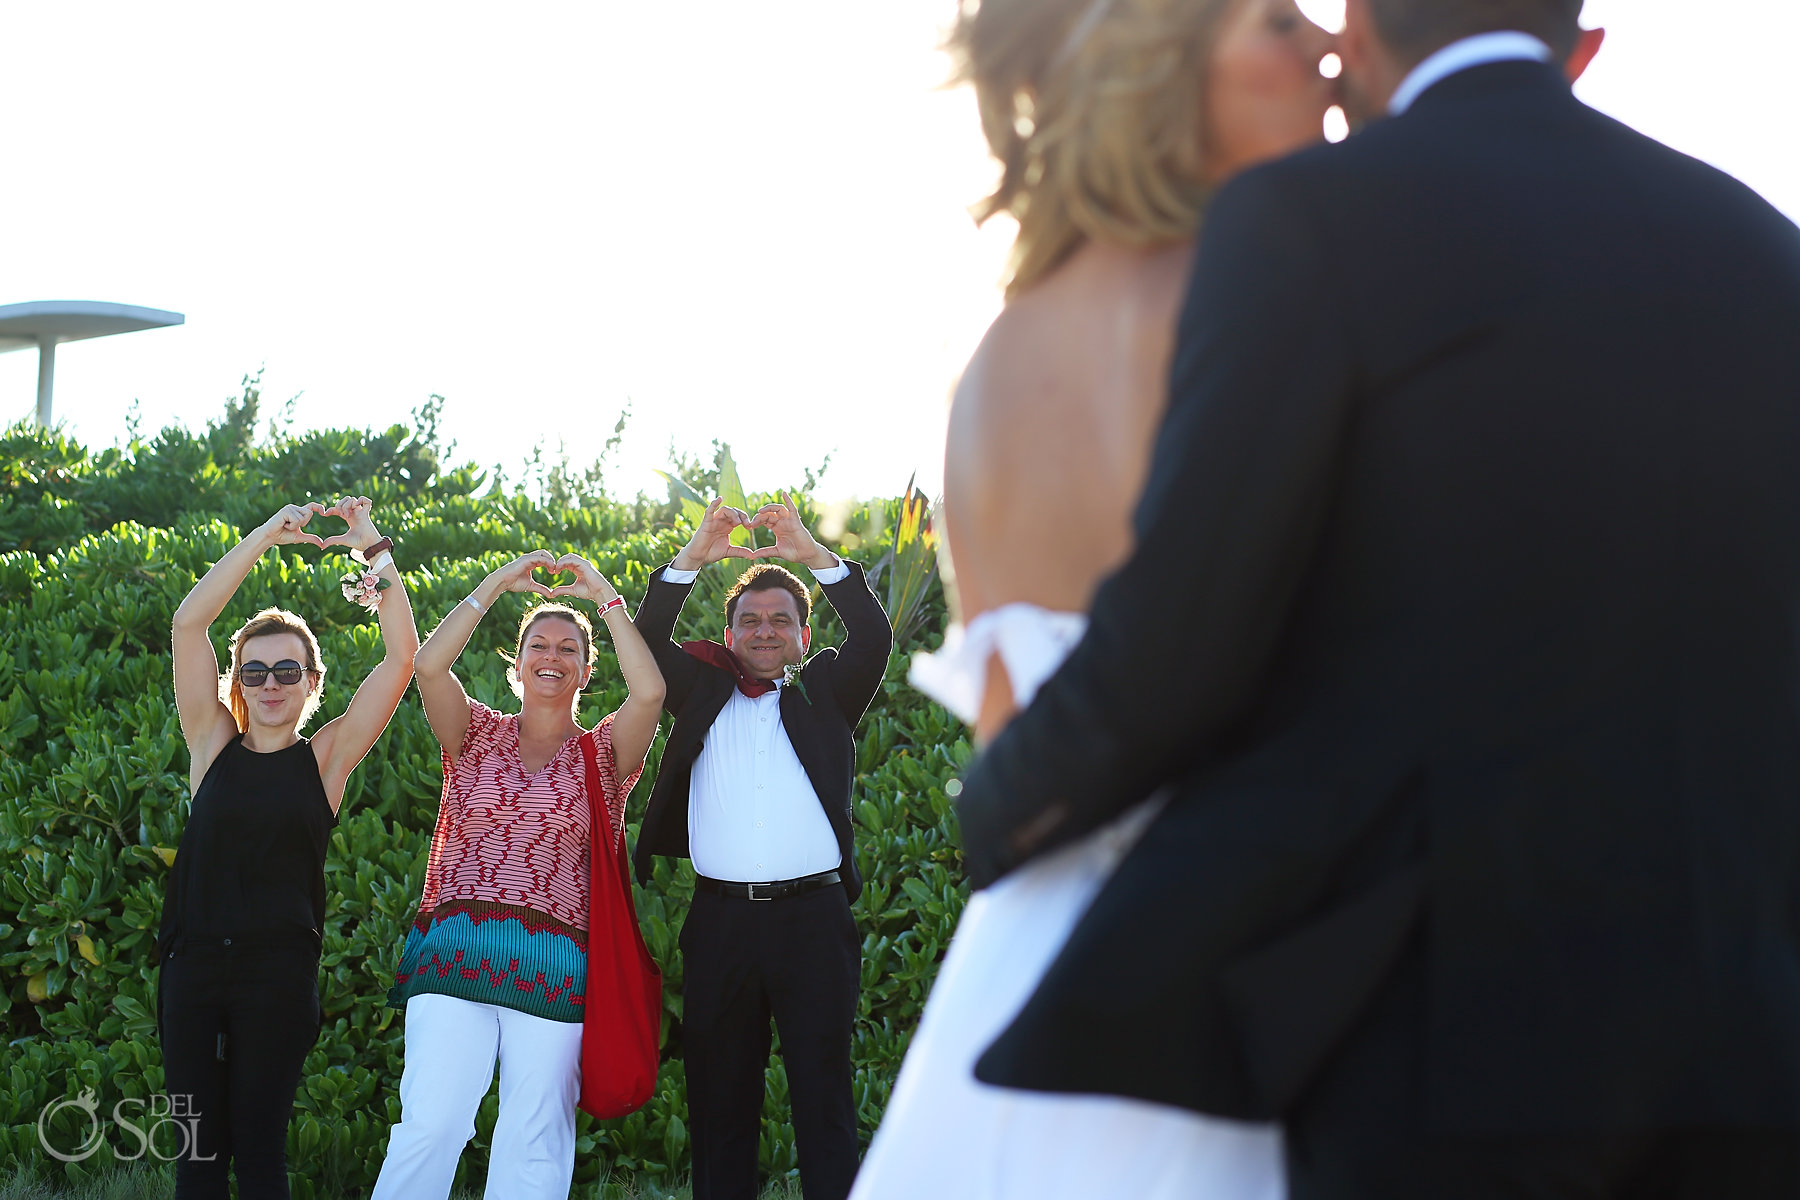 Fun Elopement Crew best elopement locations Mexico Blue Diamond Luxury Boutique Hotel